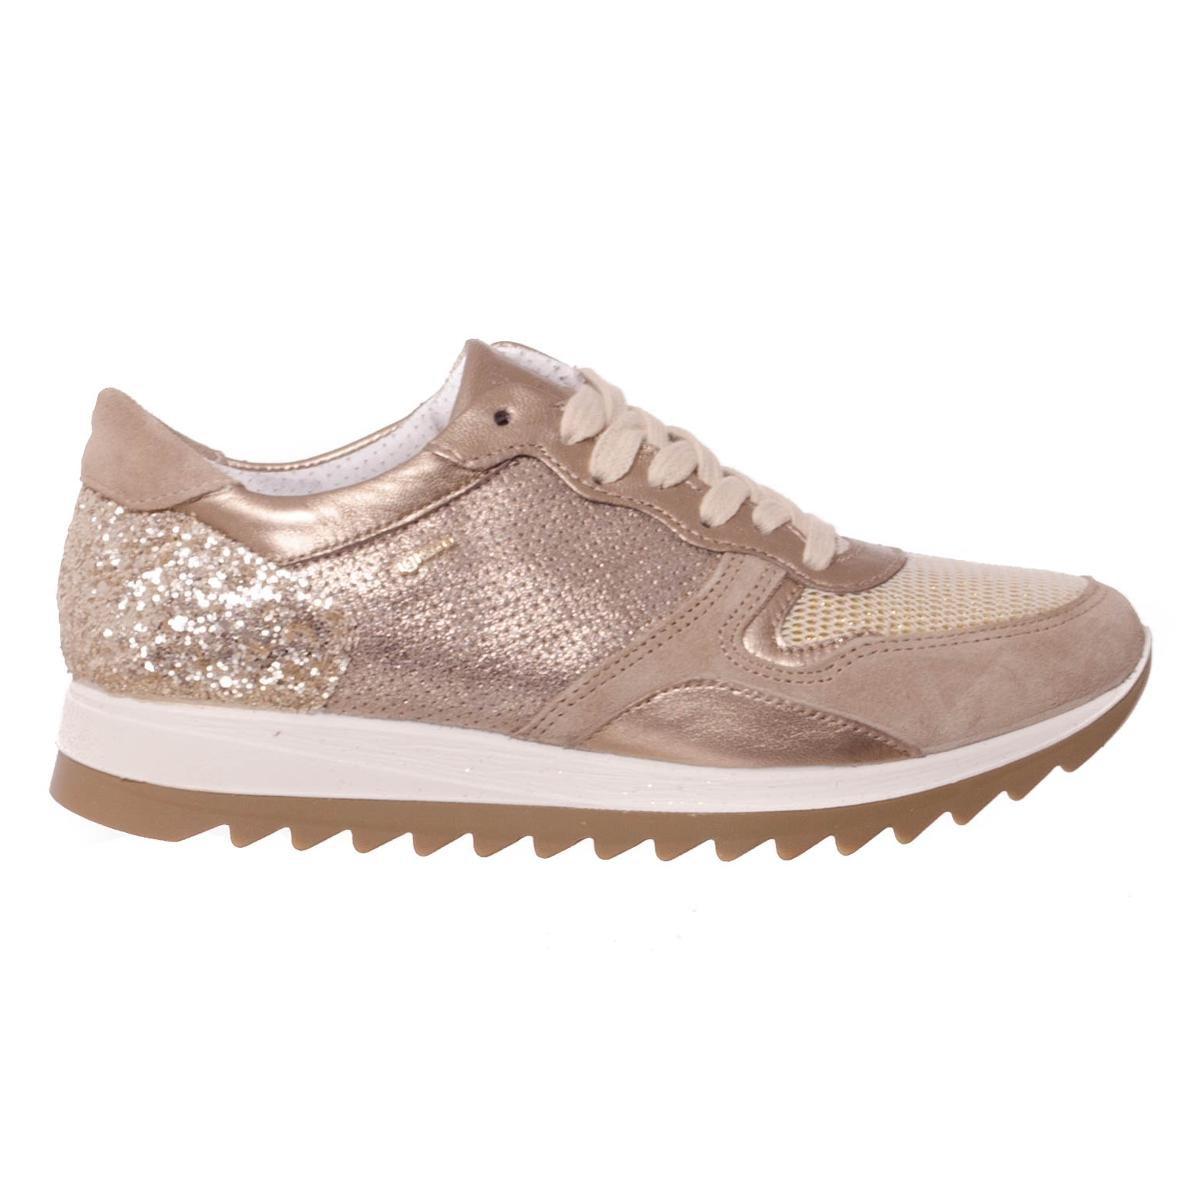 Mujeres Zapatos planos visione/oro dorado, (visione/oro) 7771300 38 EU|visione/oro